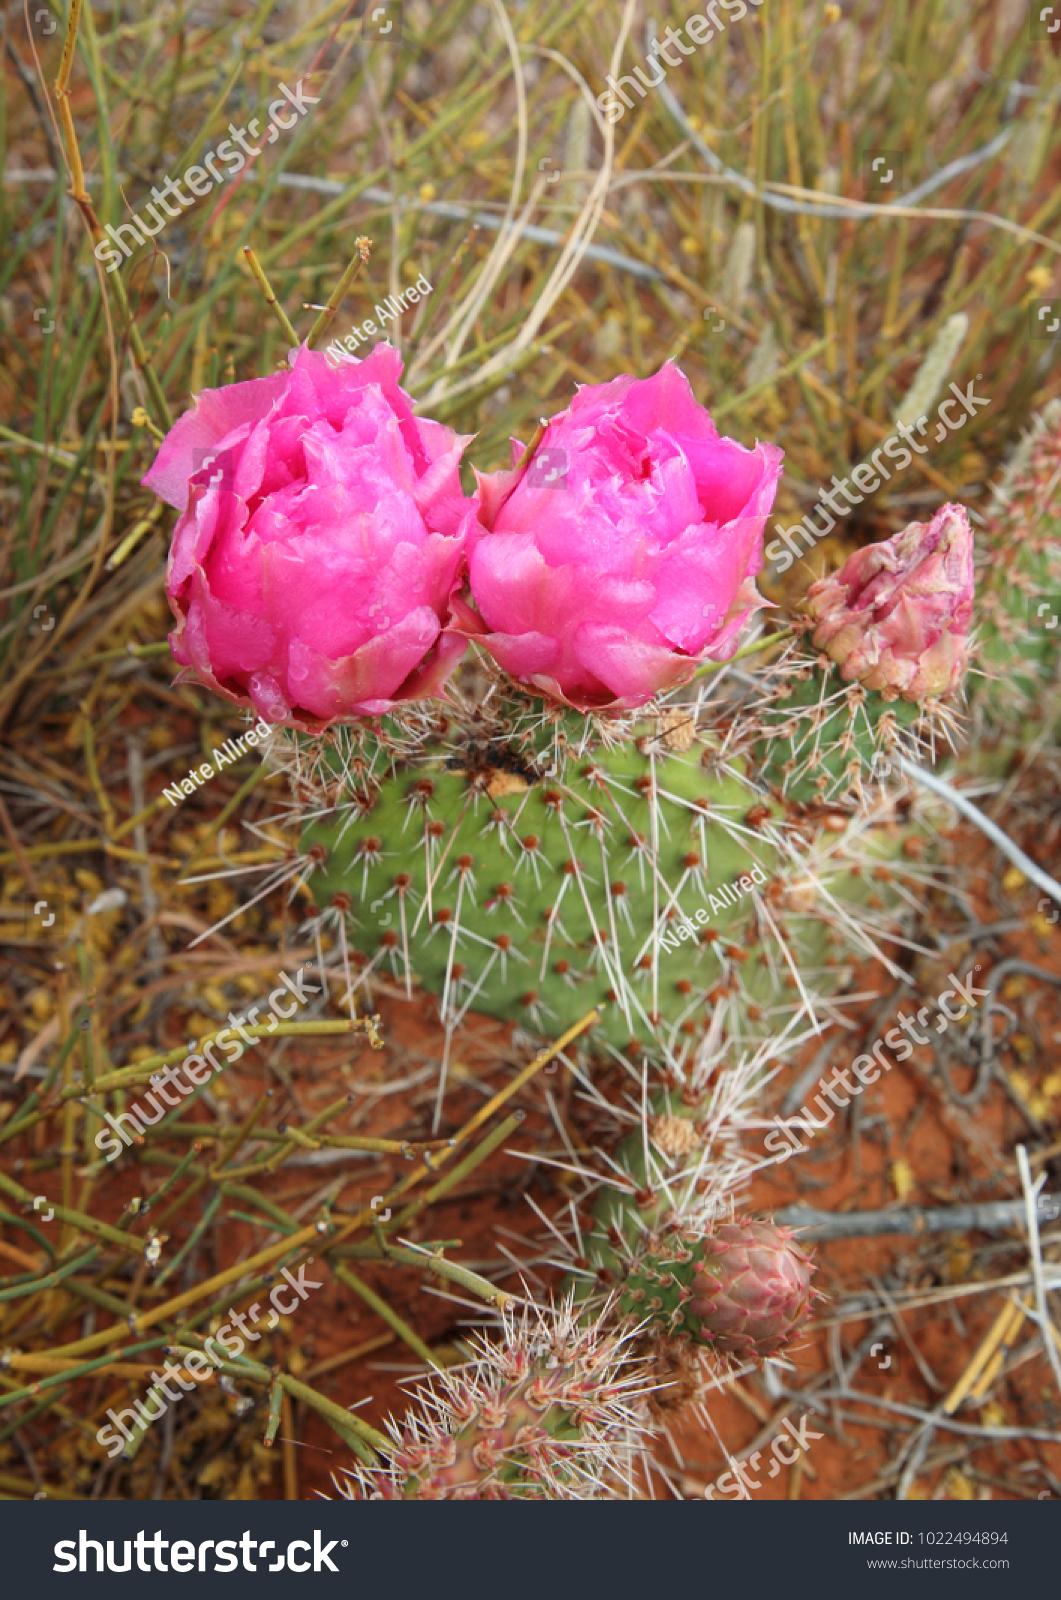 Beavertail Cactus Closeup Pink Flowers Bloom Stock Photo Royalty